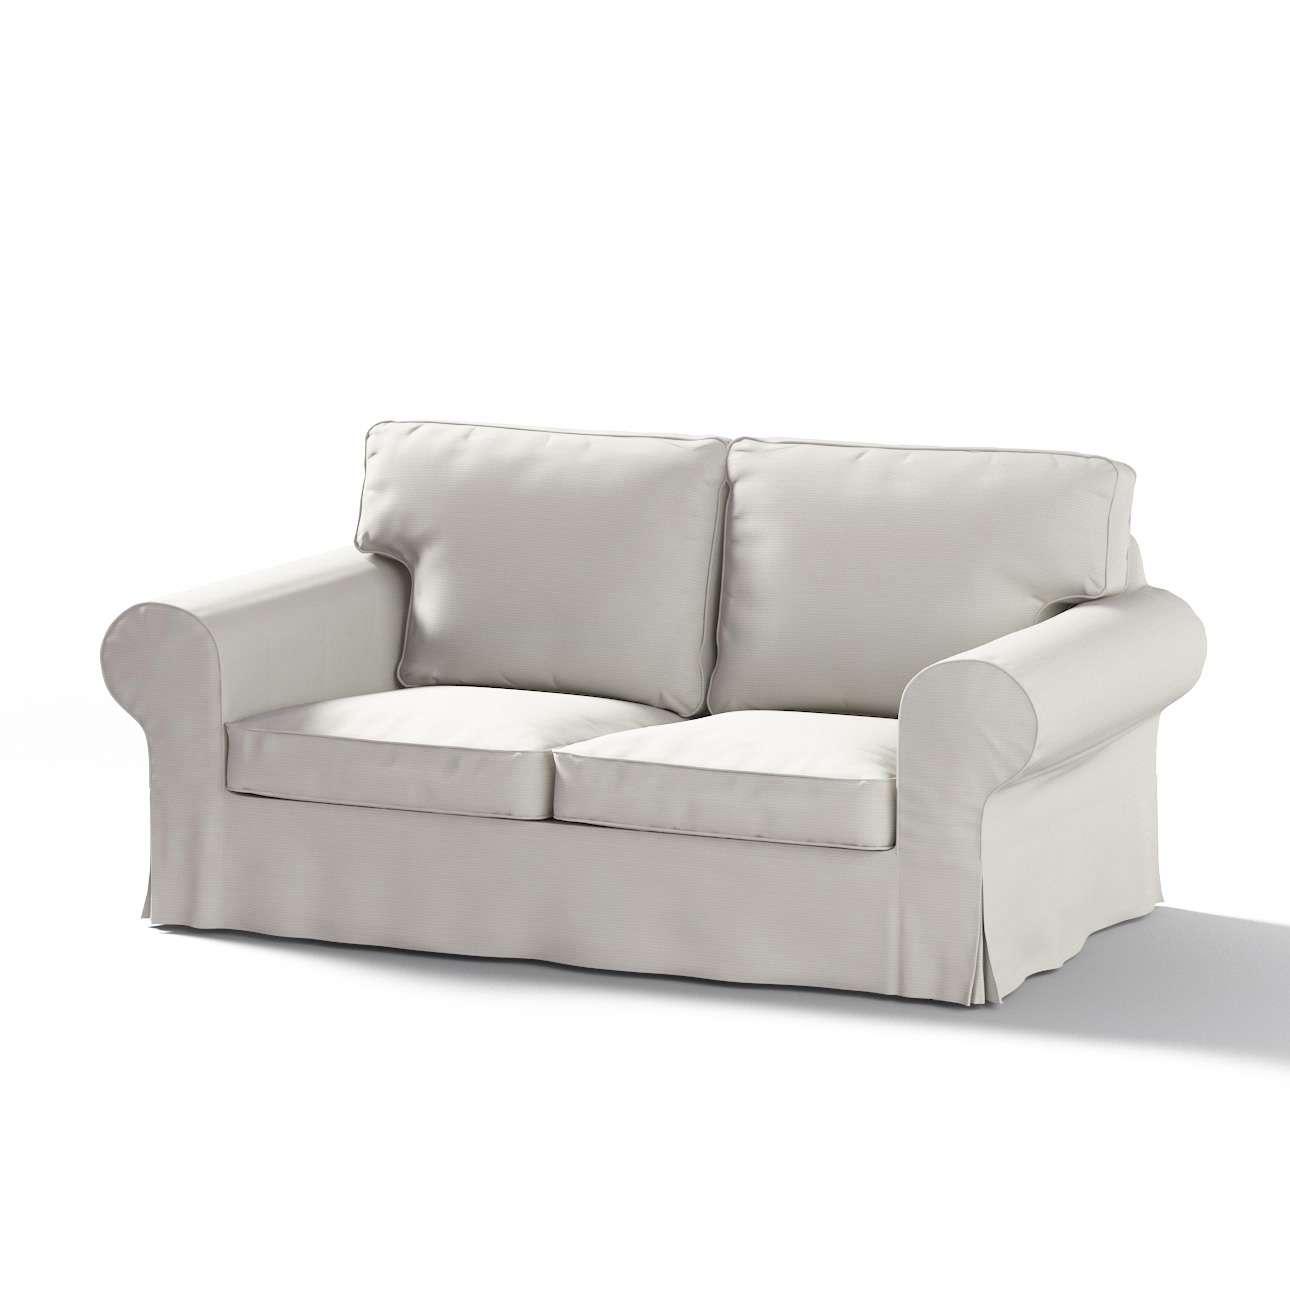 Ektorp 2-Sitzer Schlafsofabezug  ALTES Modell Sofabezug Ektorp 2-Sitzer Schlafsofa altes Modell von der Kollektion Cotton Panama, Stoff: 702-31